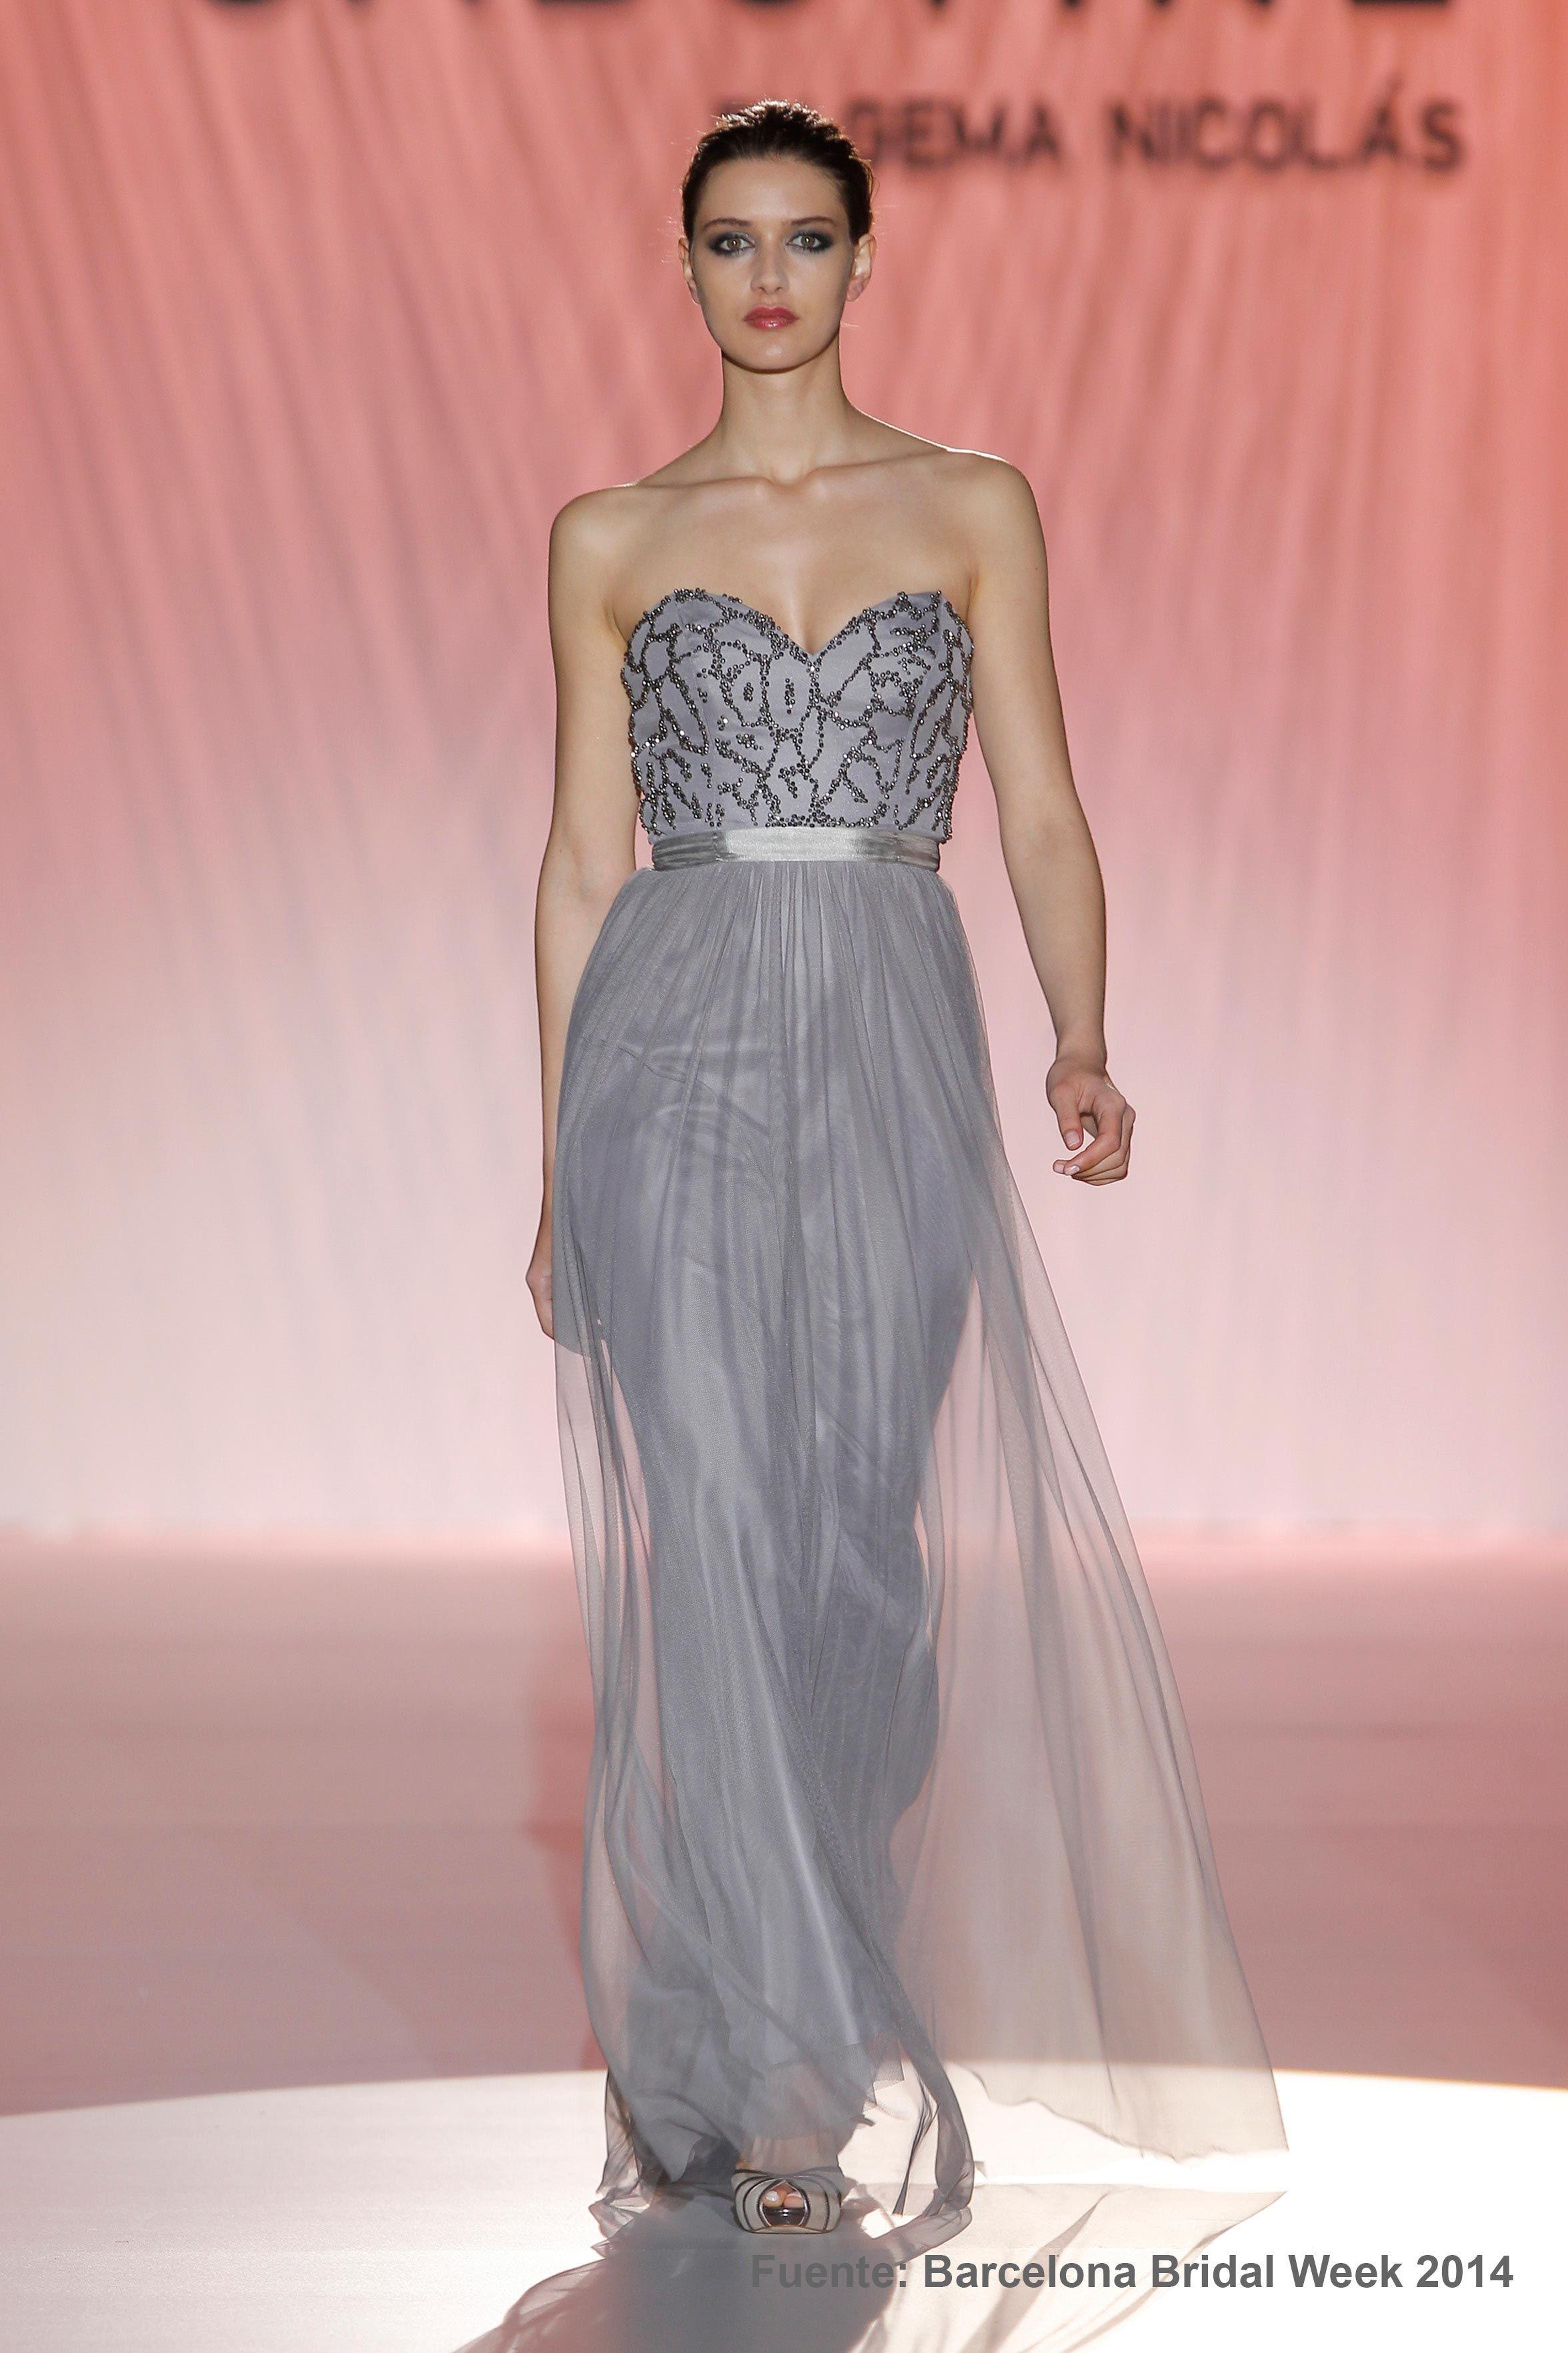 Cabotine-vestido largo gris | modas | Pinterest | Vestidos largos ...